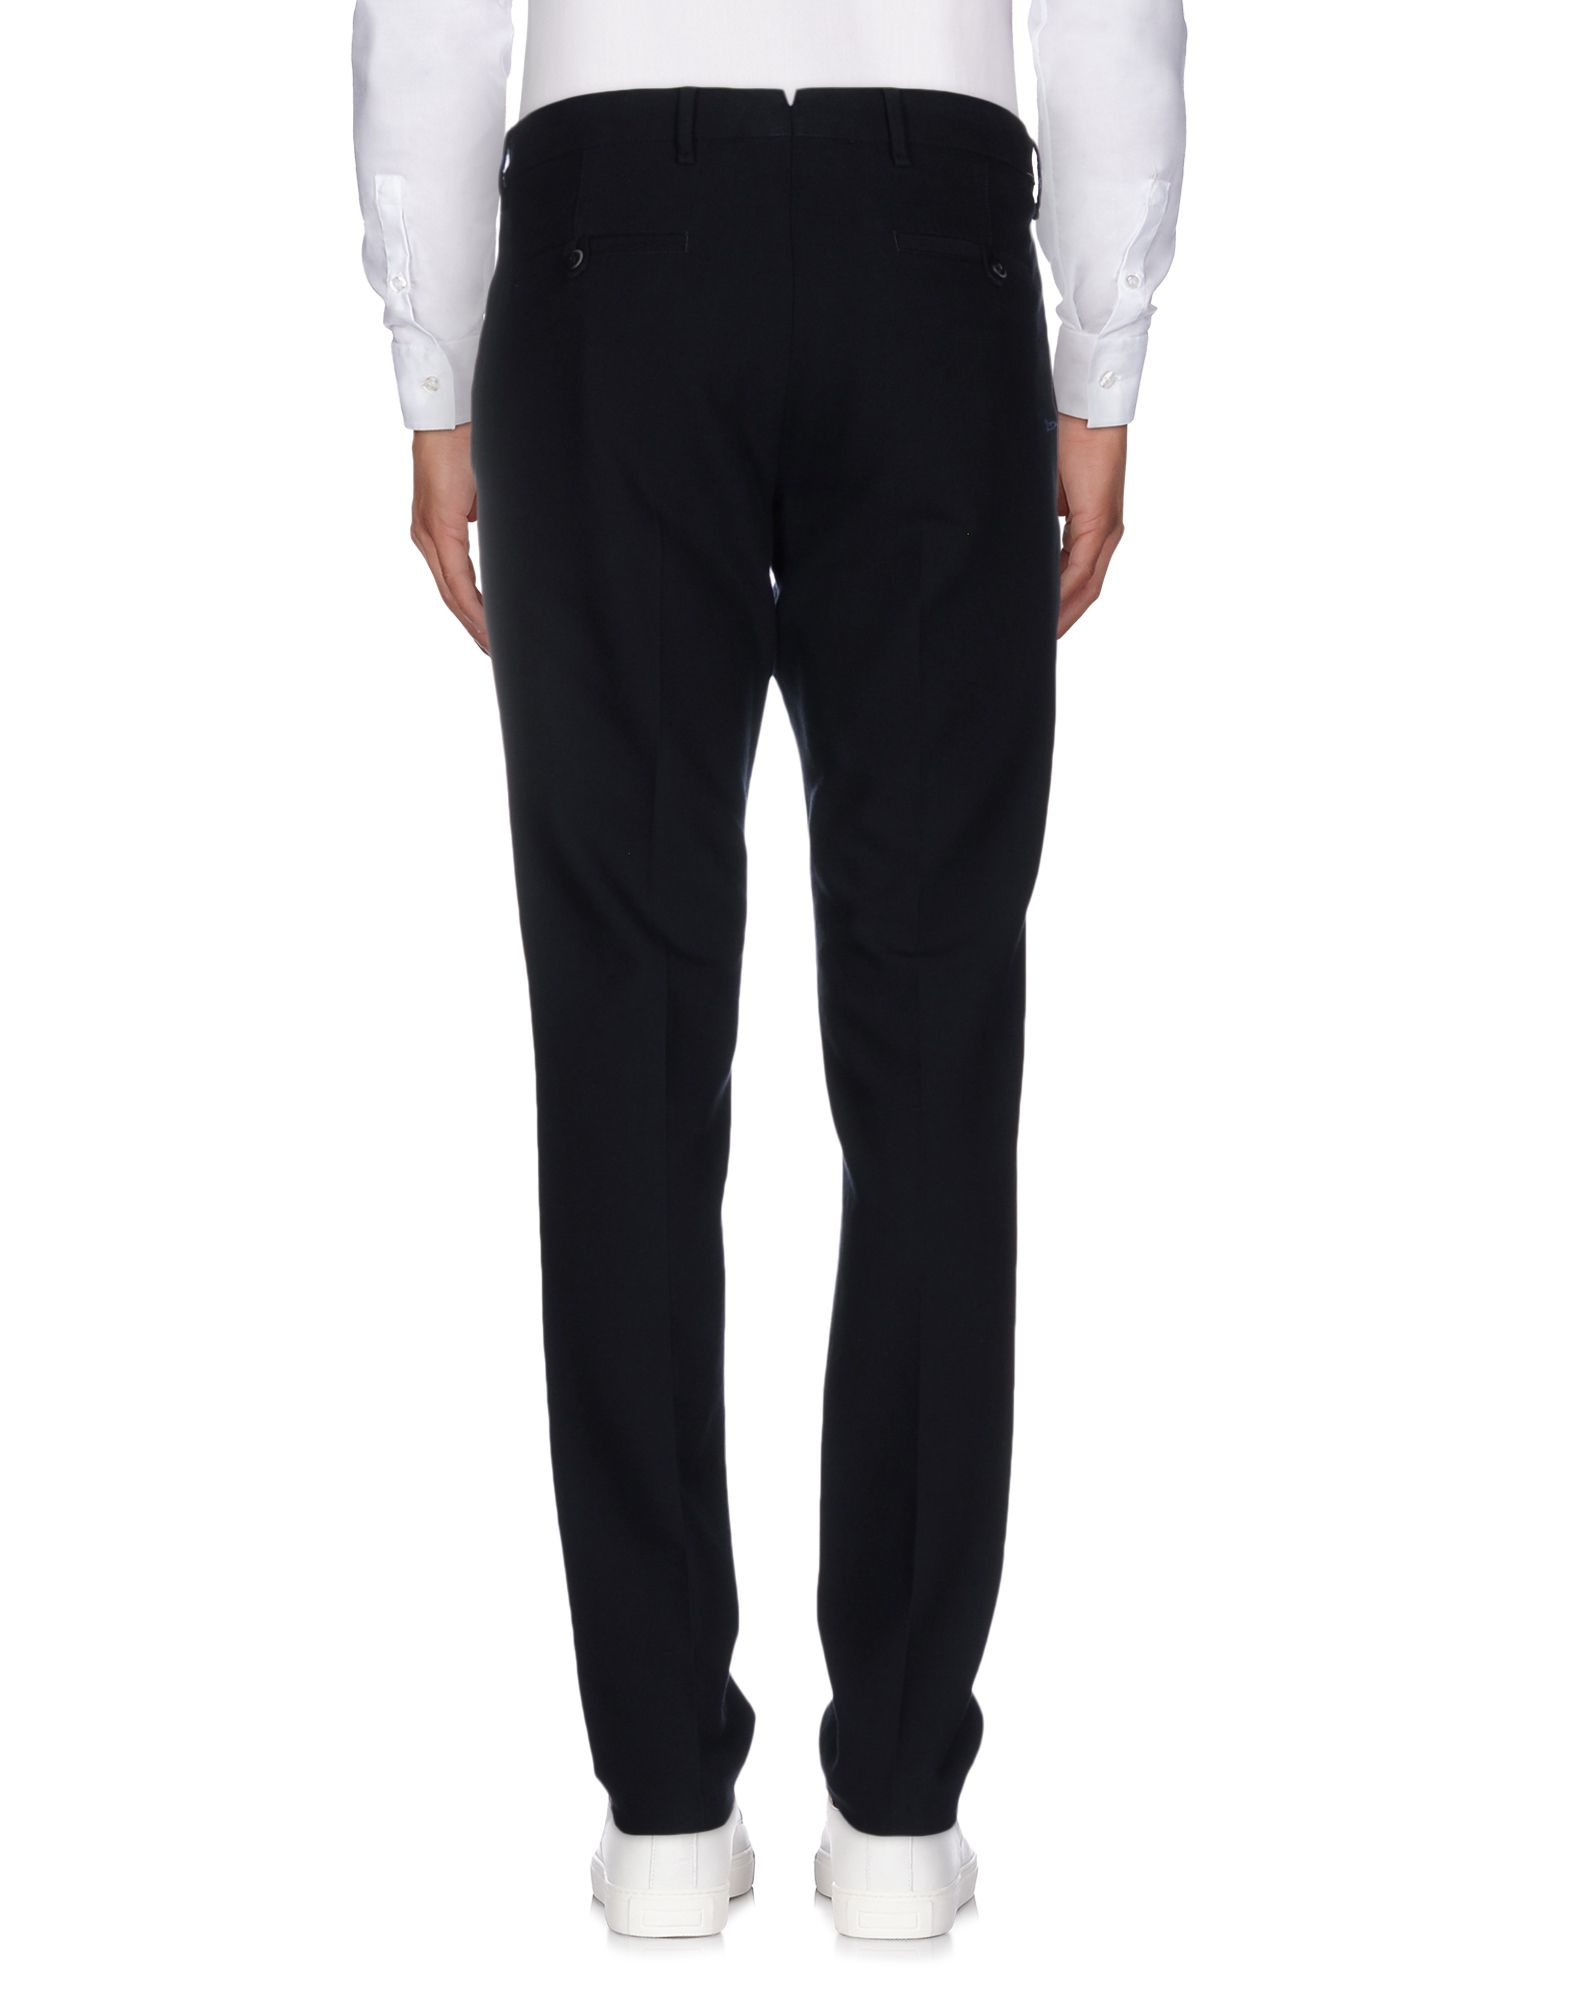 Lardini Cotton Casual Trouser in Dark Blue (Blue) for Men